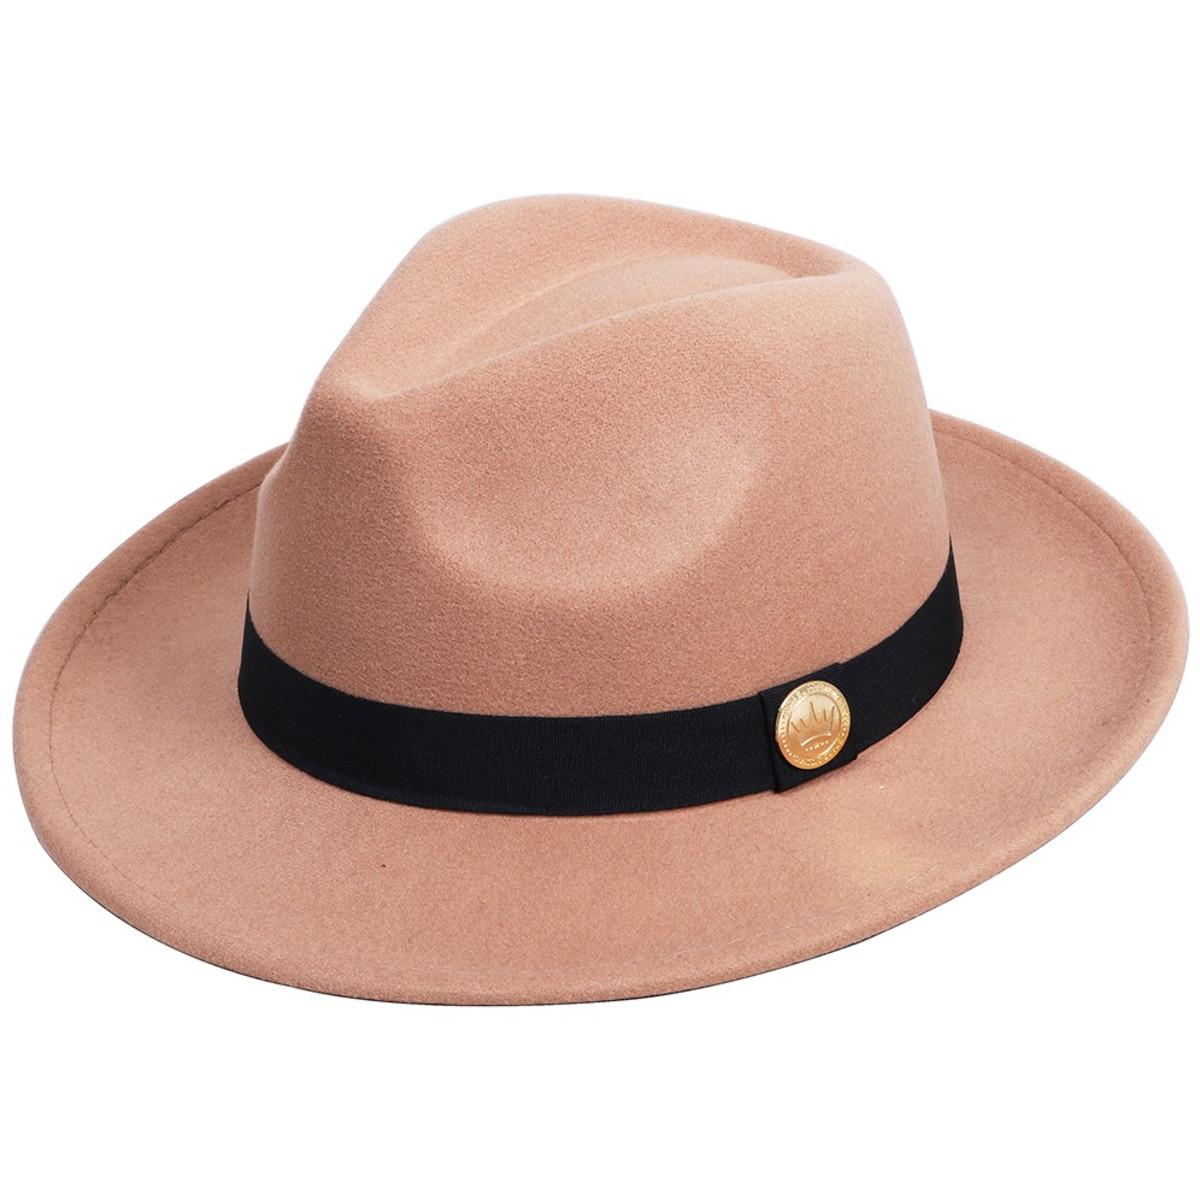 Chapéu Real Arte Fedora Aba Curta Cinza - Compre Agora